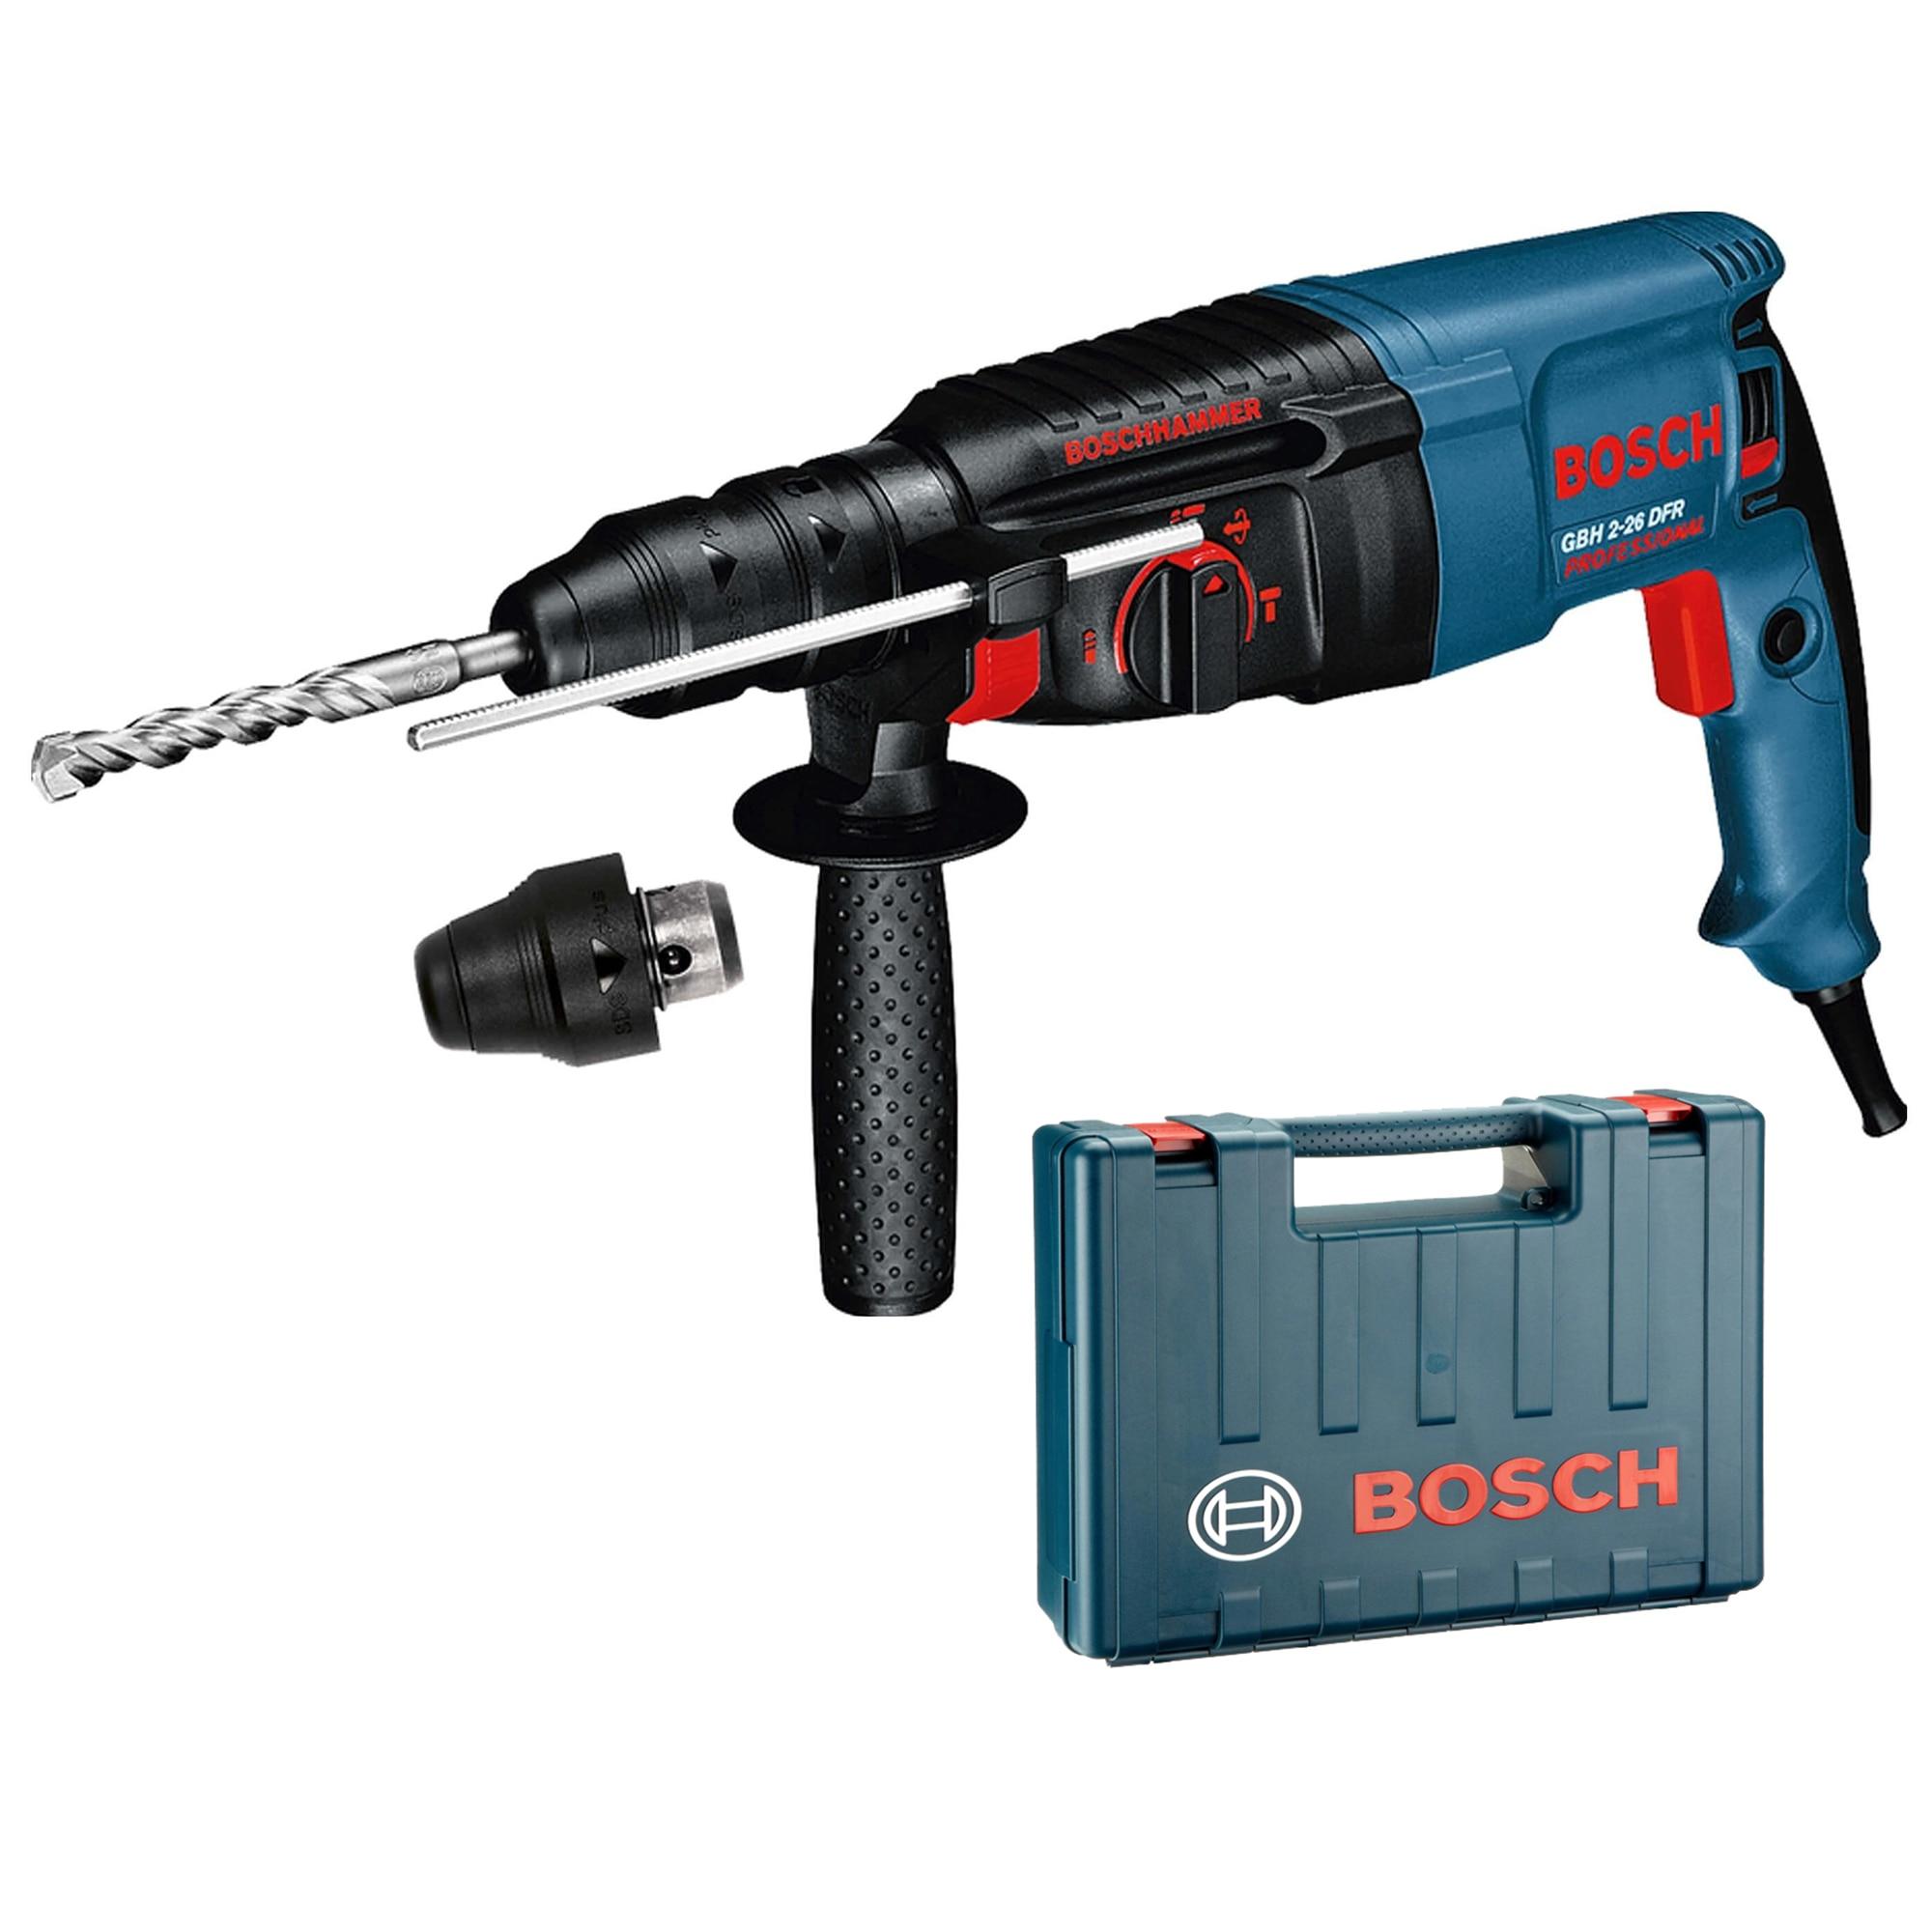 Fotografie Ciocan rotopercutor Bosch Professional GBH 2-26 DFR, 800 W, 900 RPM, 2.7 J + Mandrina interschimbabila SDS-Plus